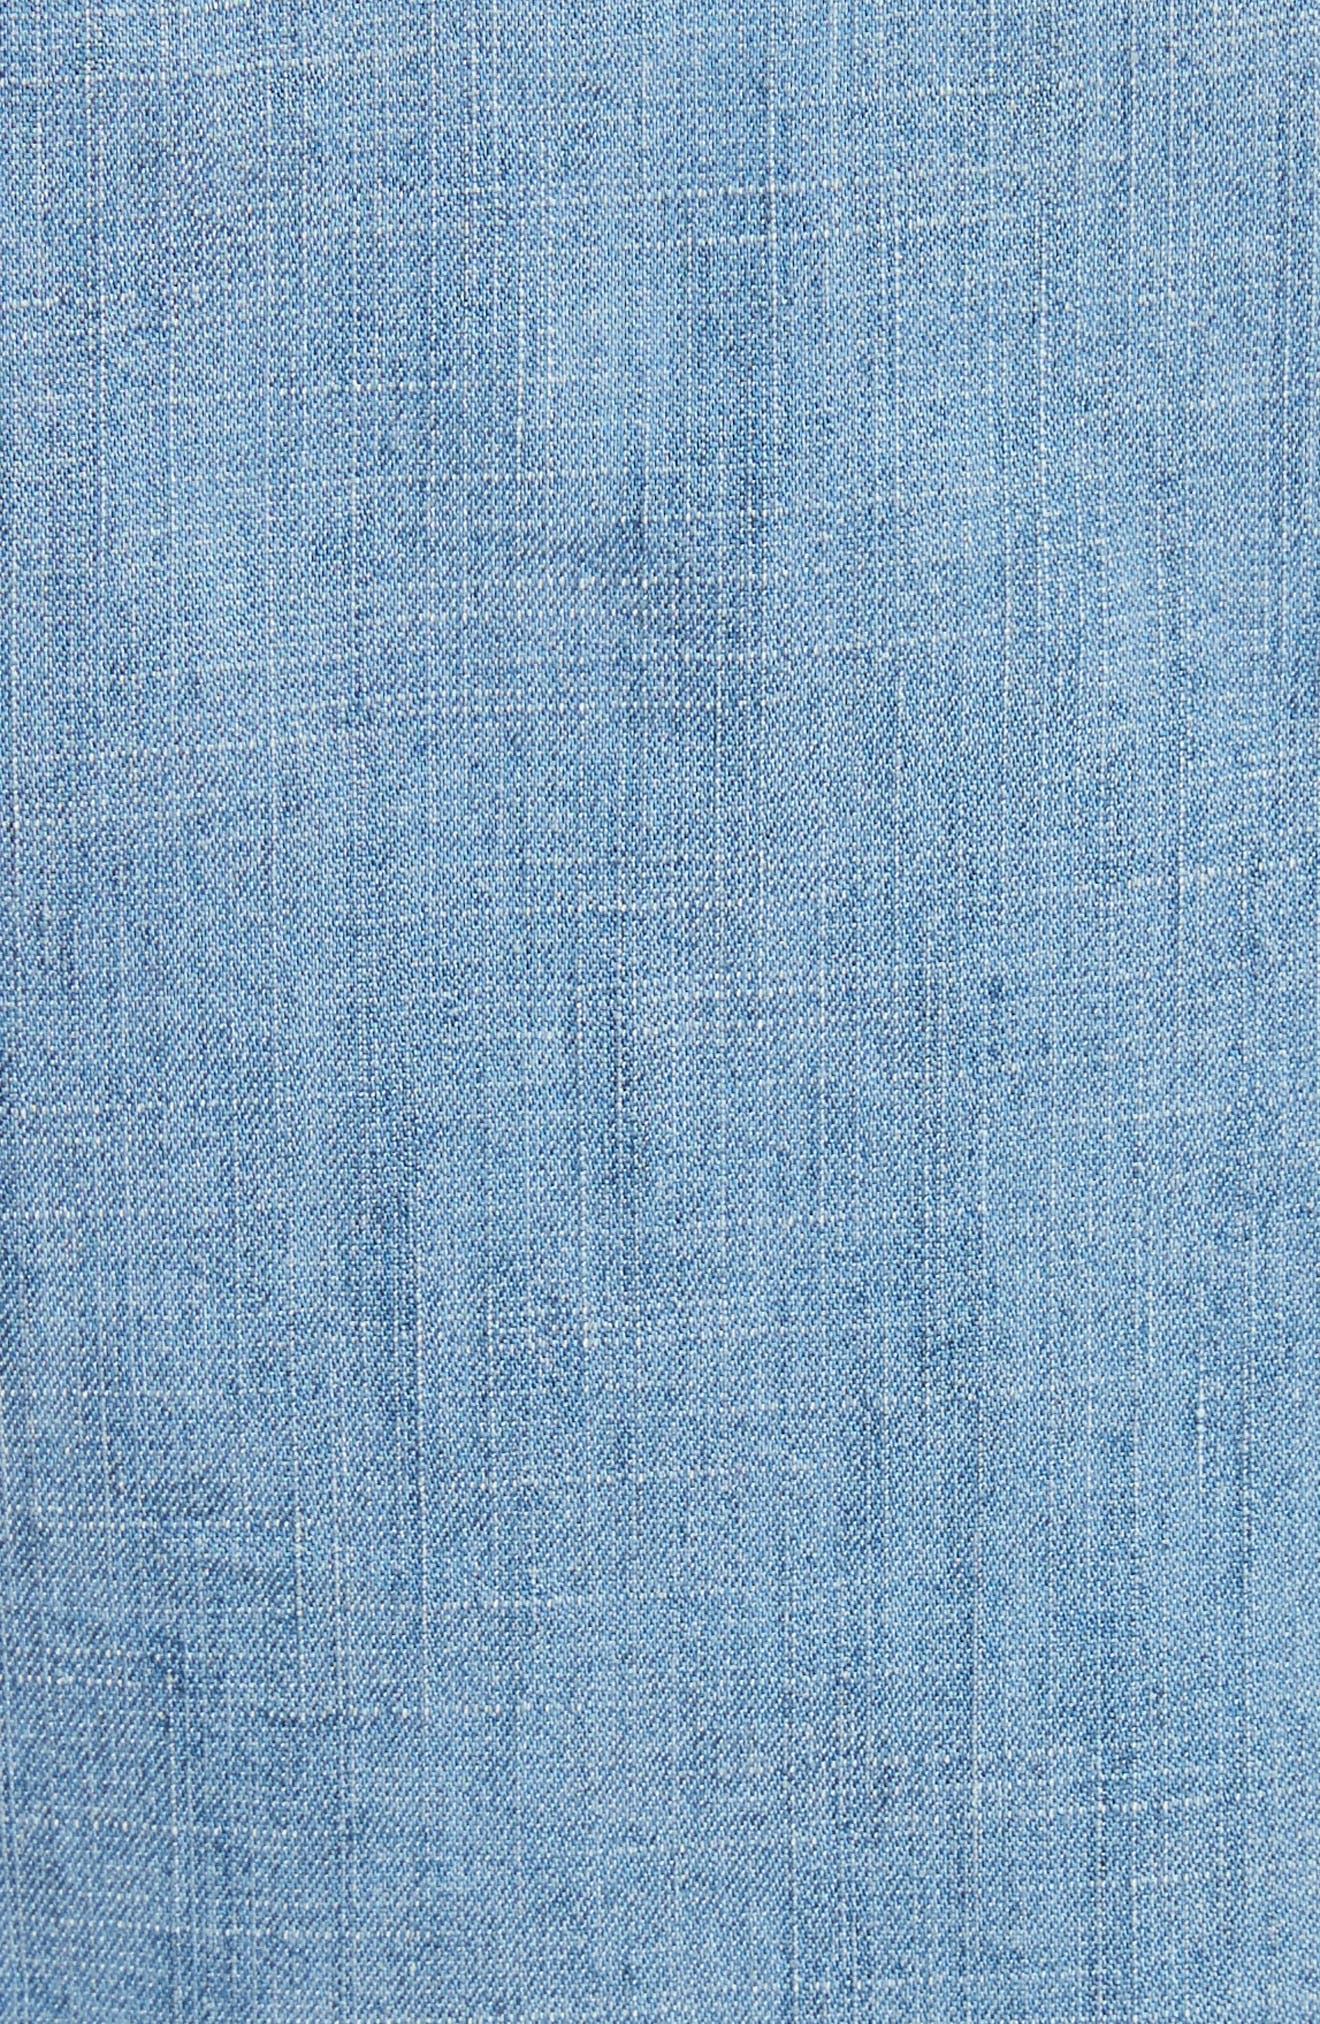 Eloise Appliqué Roll-Cuff Shirt,                             Alternate thumbnail 5, color,                             484